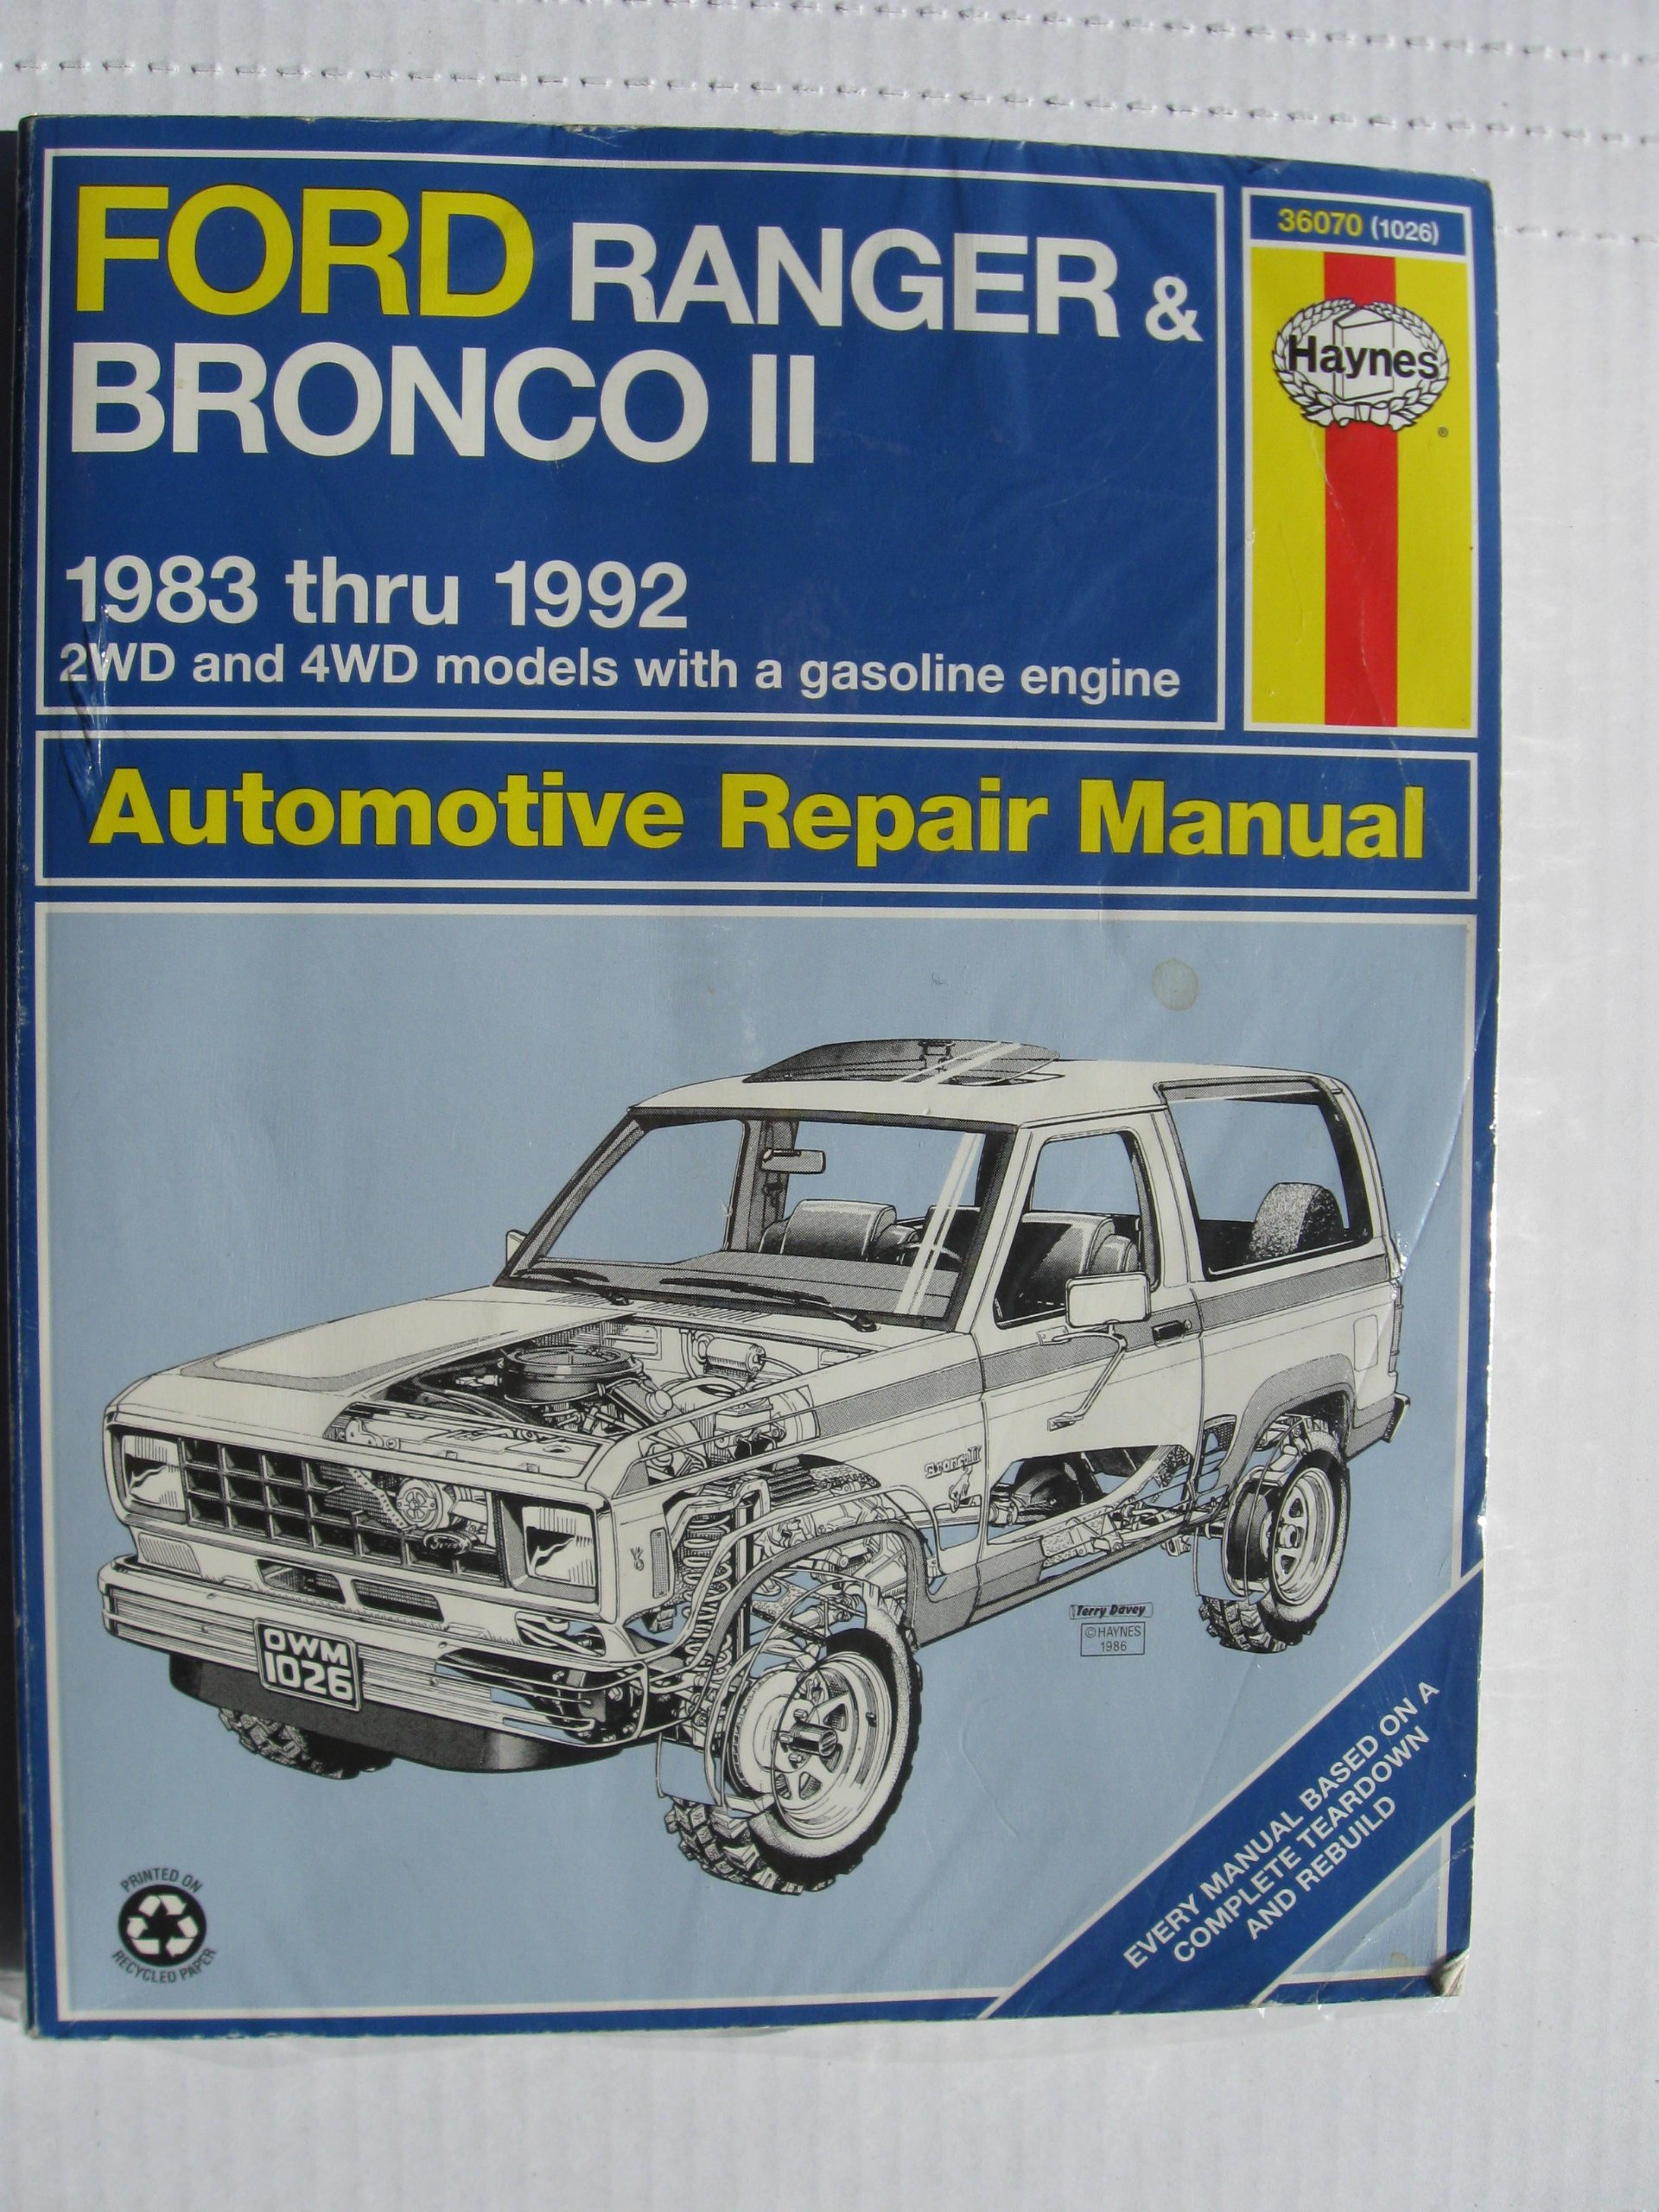 ford ranger and bronco ii automotive repair manual 1983 1993 2wd rh amazon com 1989 Ford Ranger Interior 1989 ford ranger repair manual free download